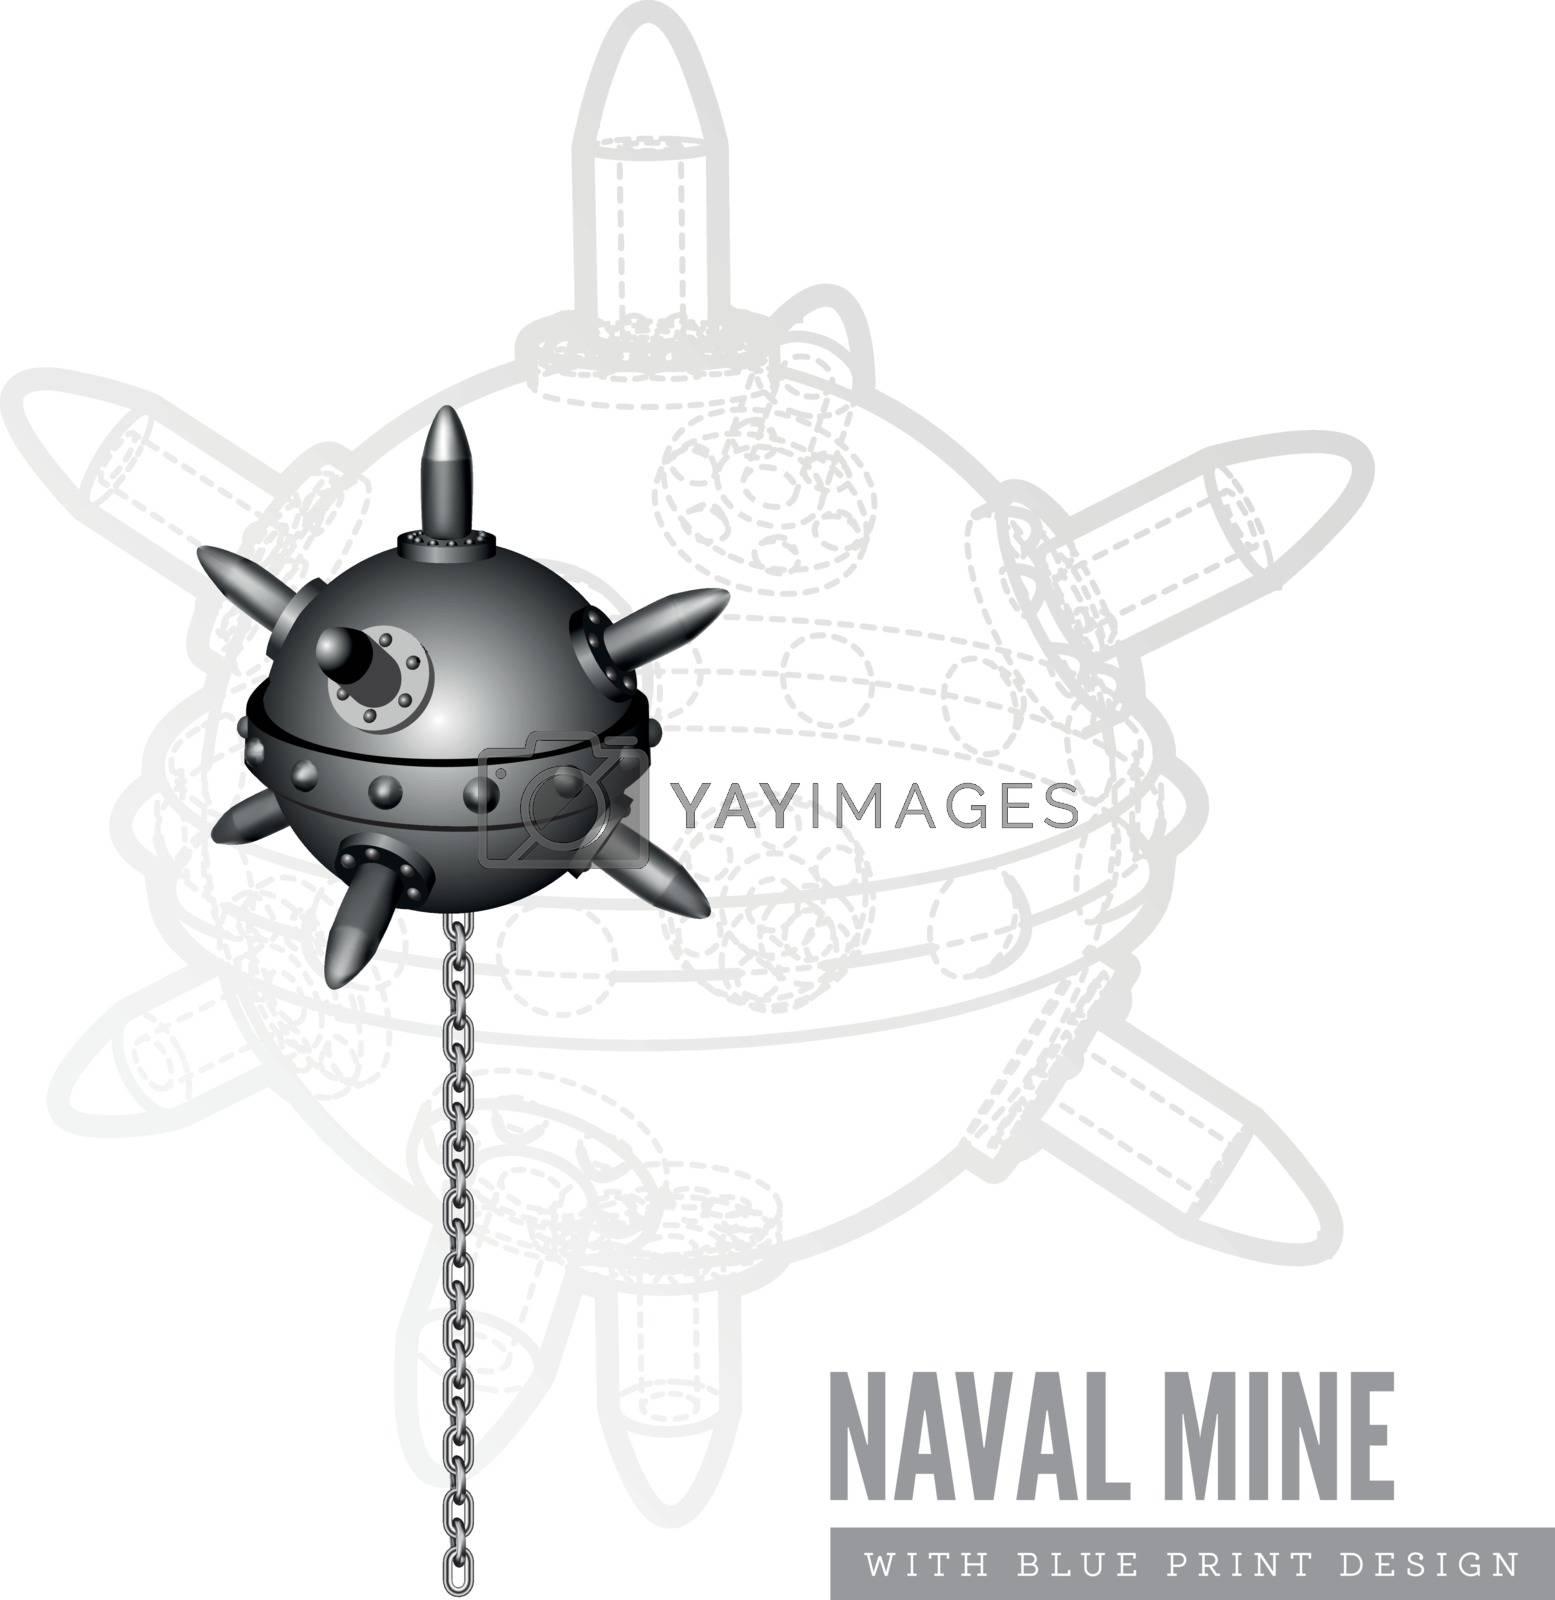 Naval mine vector illustration on white background